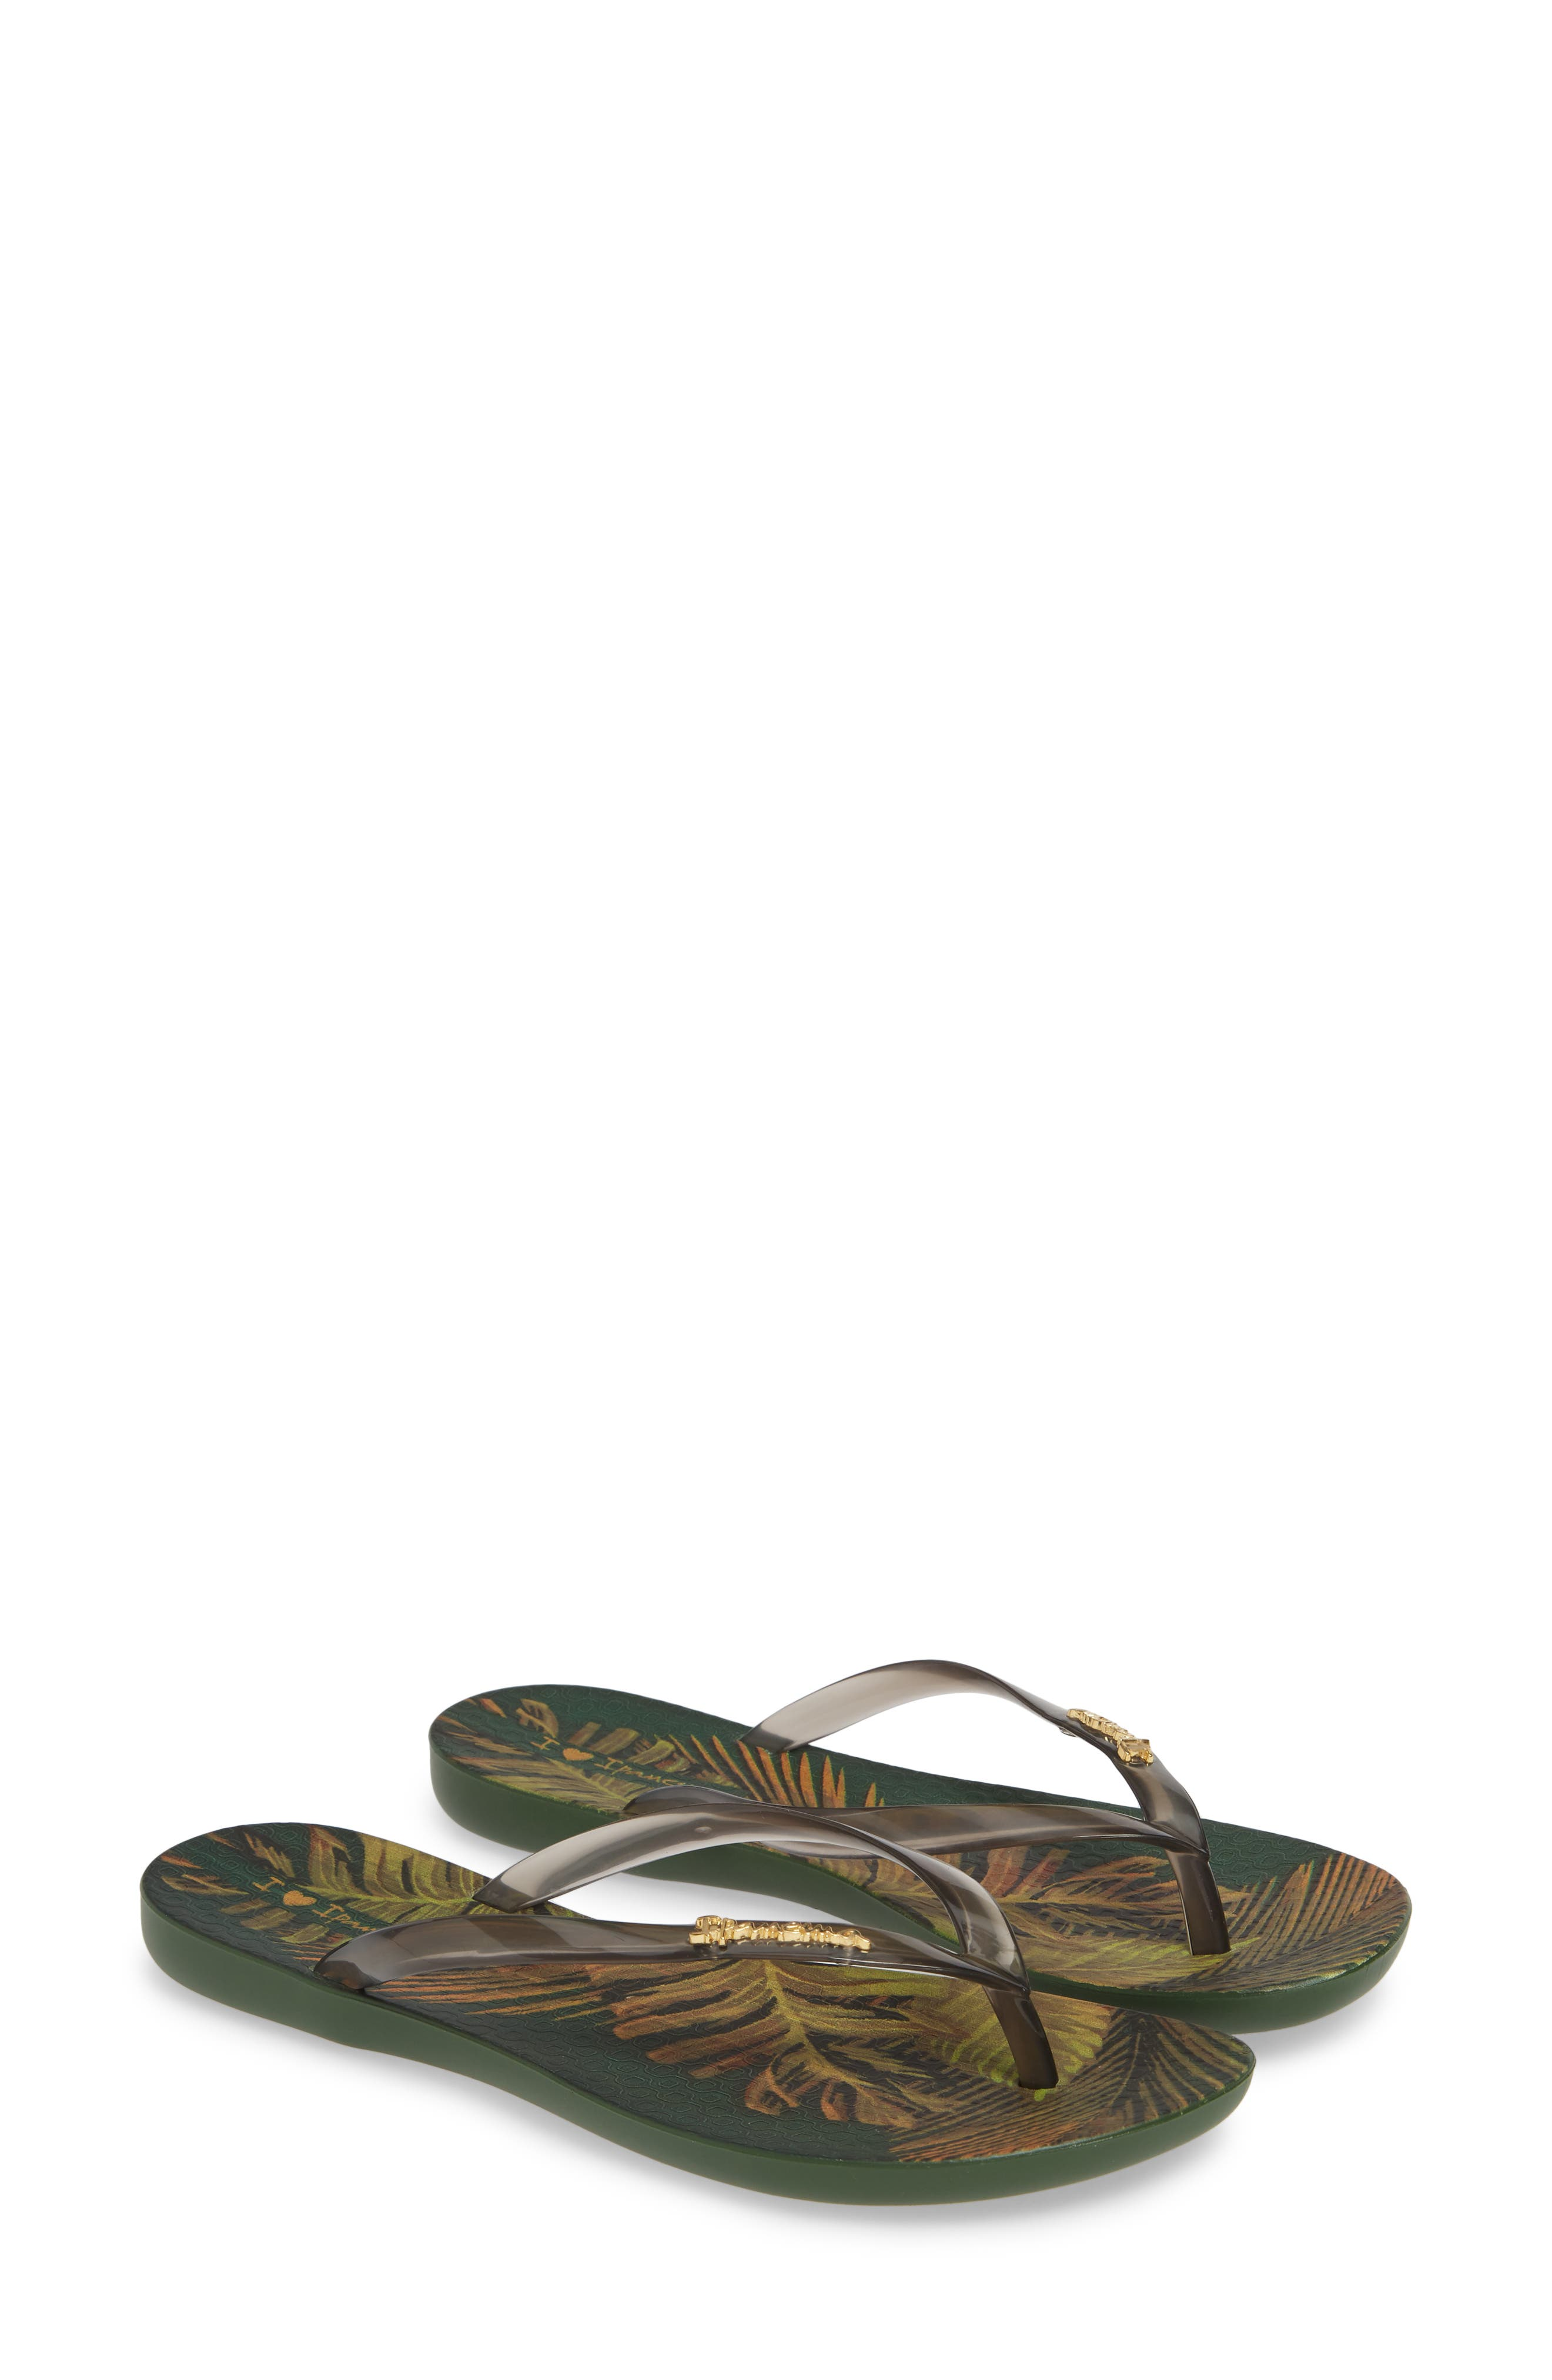 8b2a04878ba Women s Ipanema Sandals